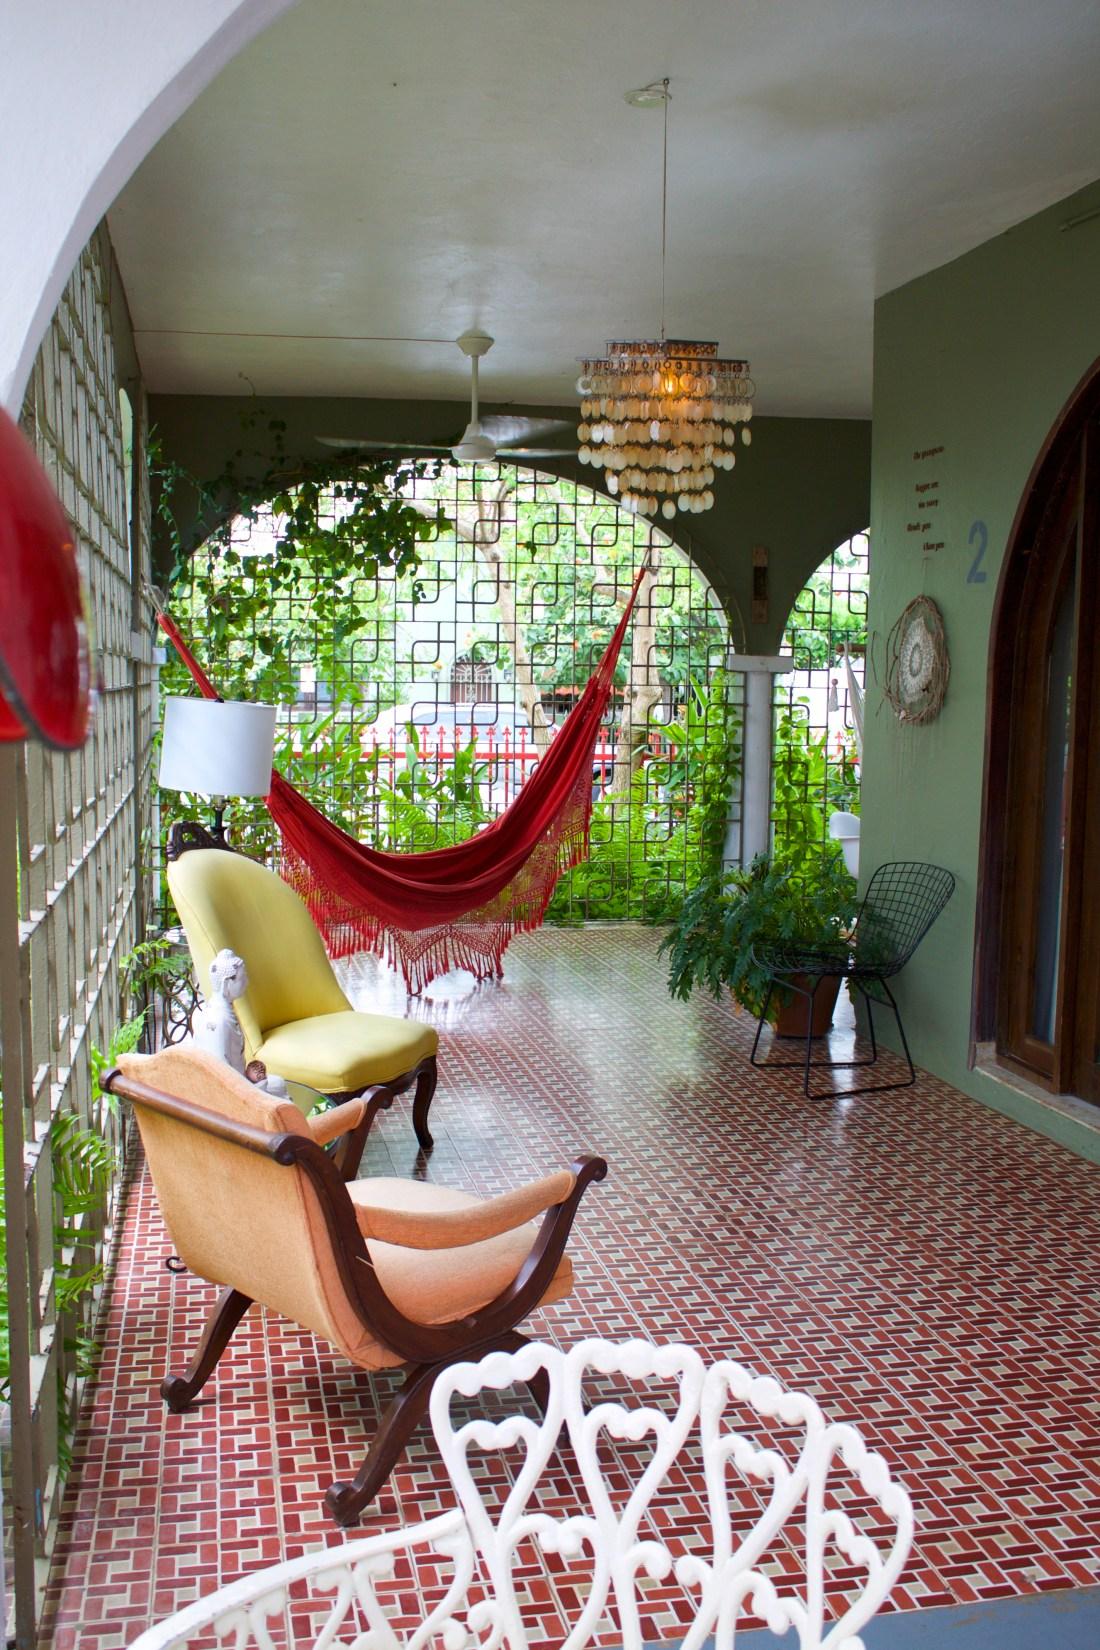 Dreamcatcher hotel San Juan